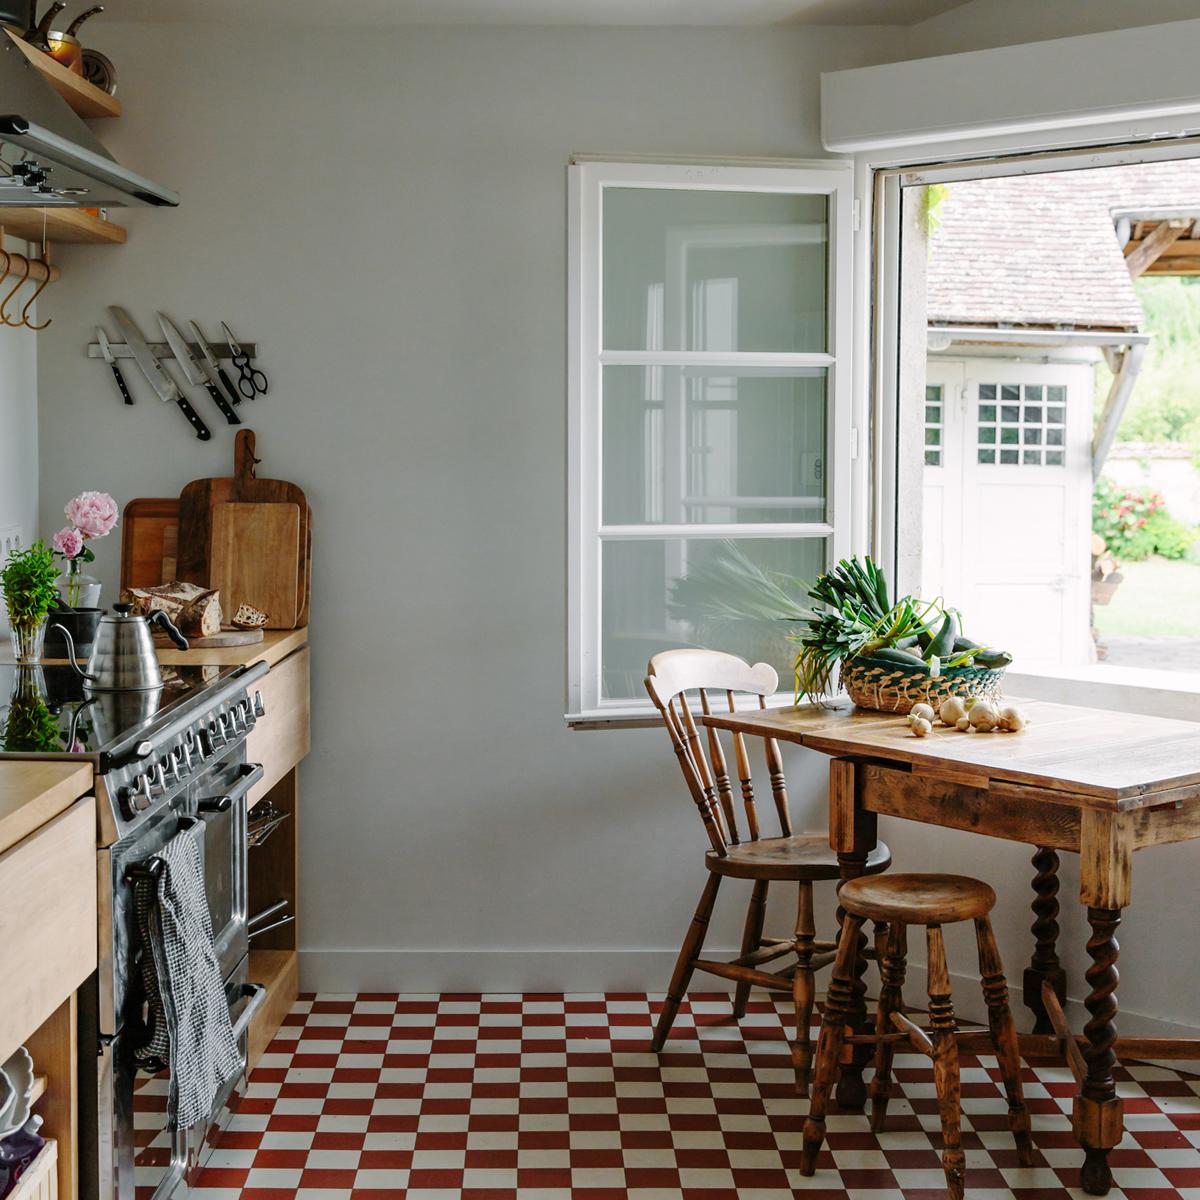 Idee per decorare una cucina in stile vintage